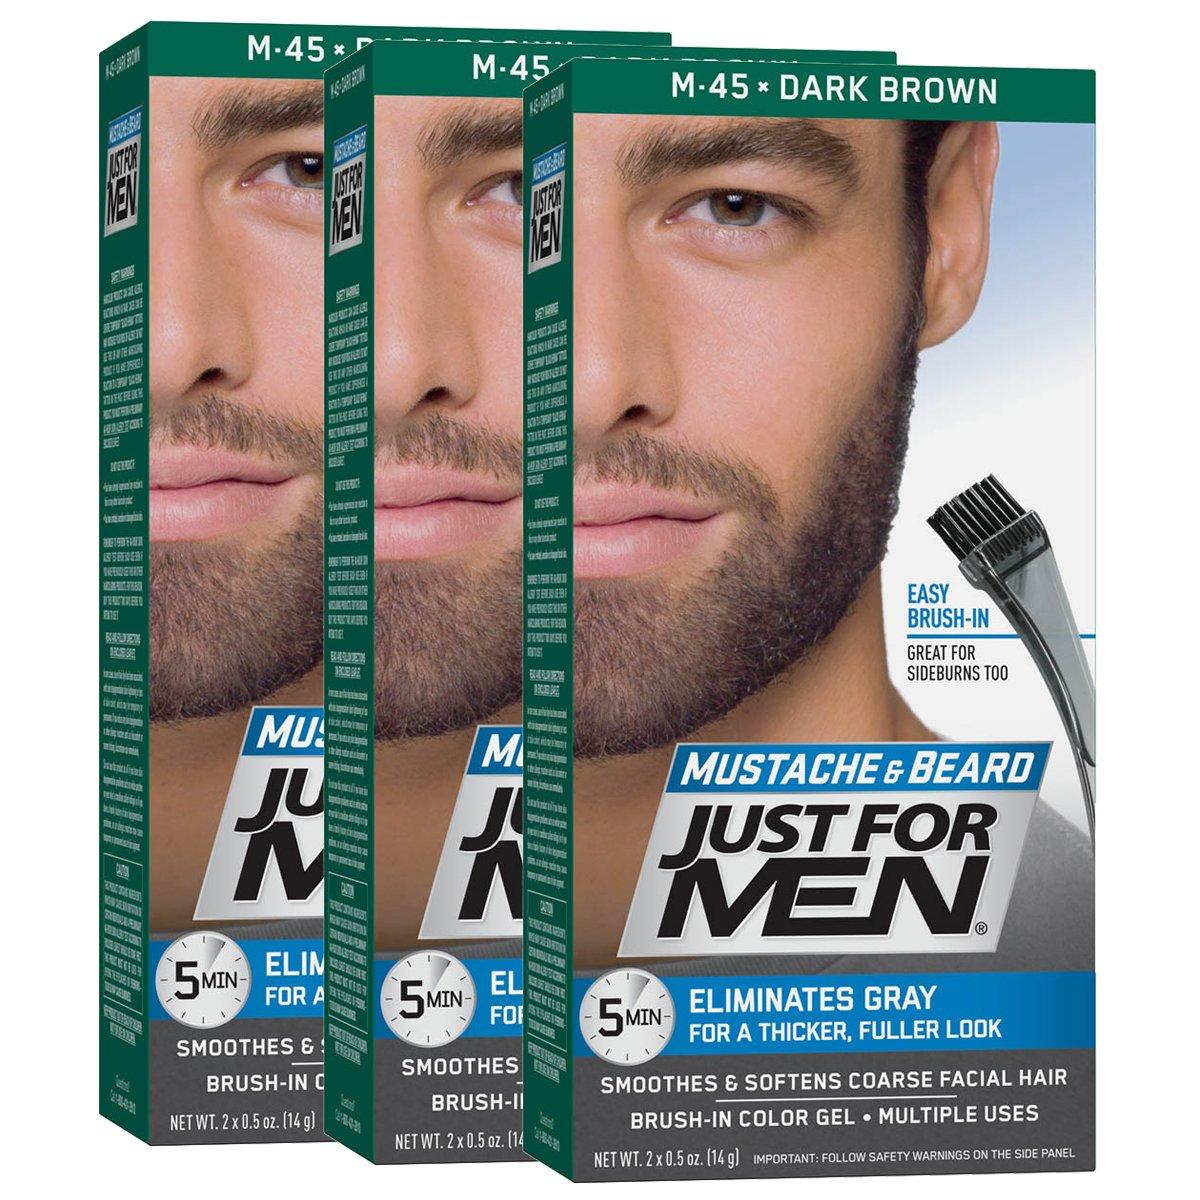 Just For Men Mustache & Beard Brush-In Color Gel, Dark Brown (Pack of 3) by Just for Men